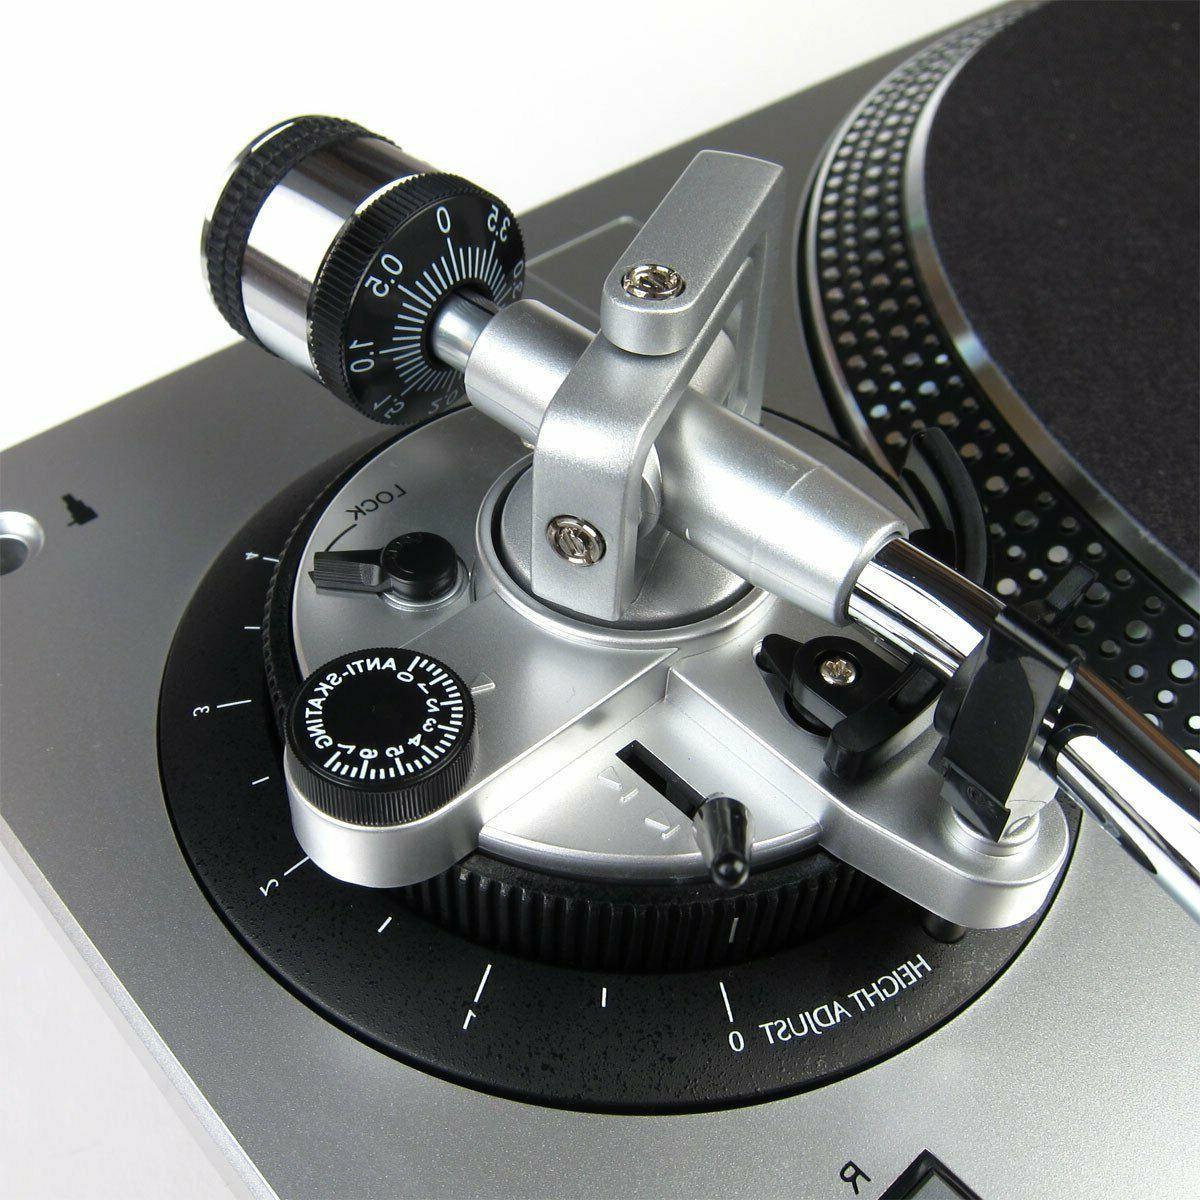 Audio-Technica Pro Stereo Turntable